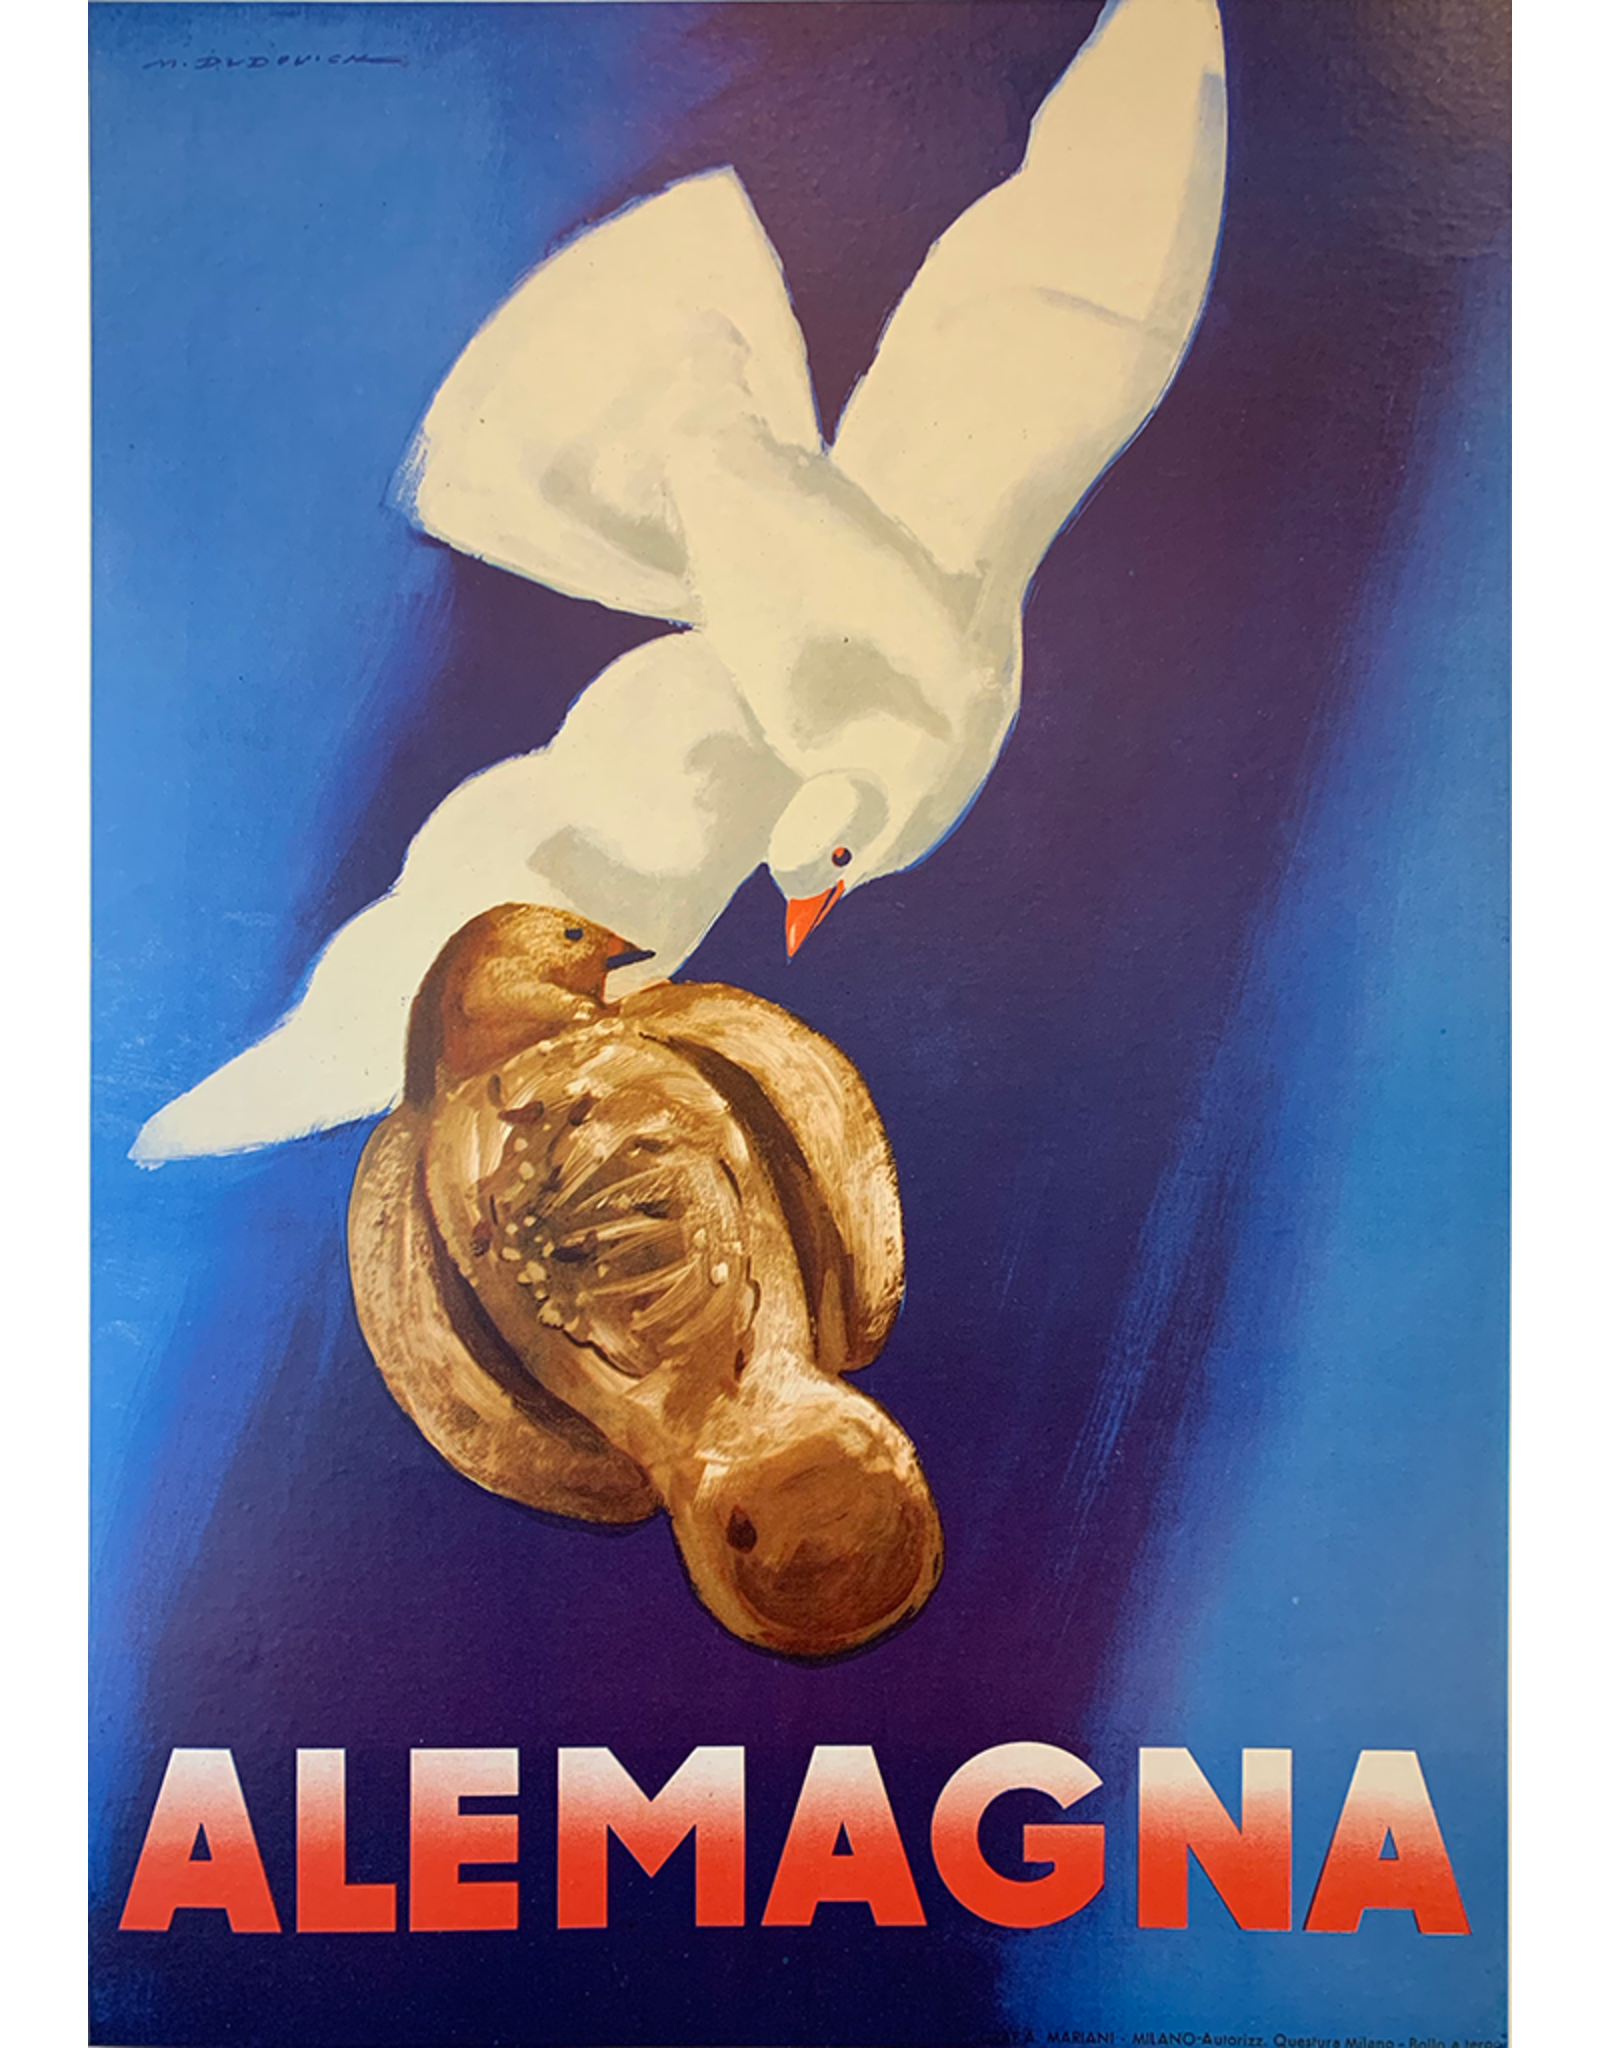 SPV Alemagna